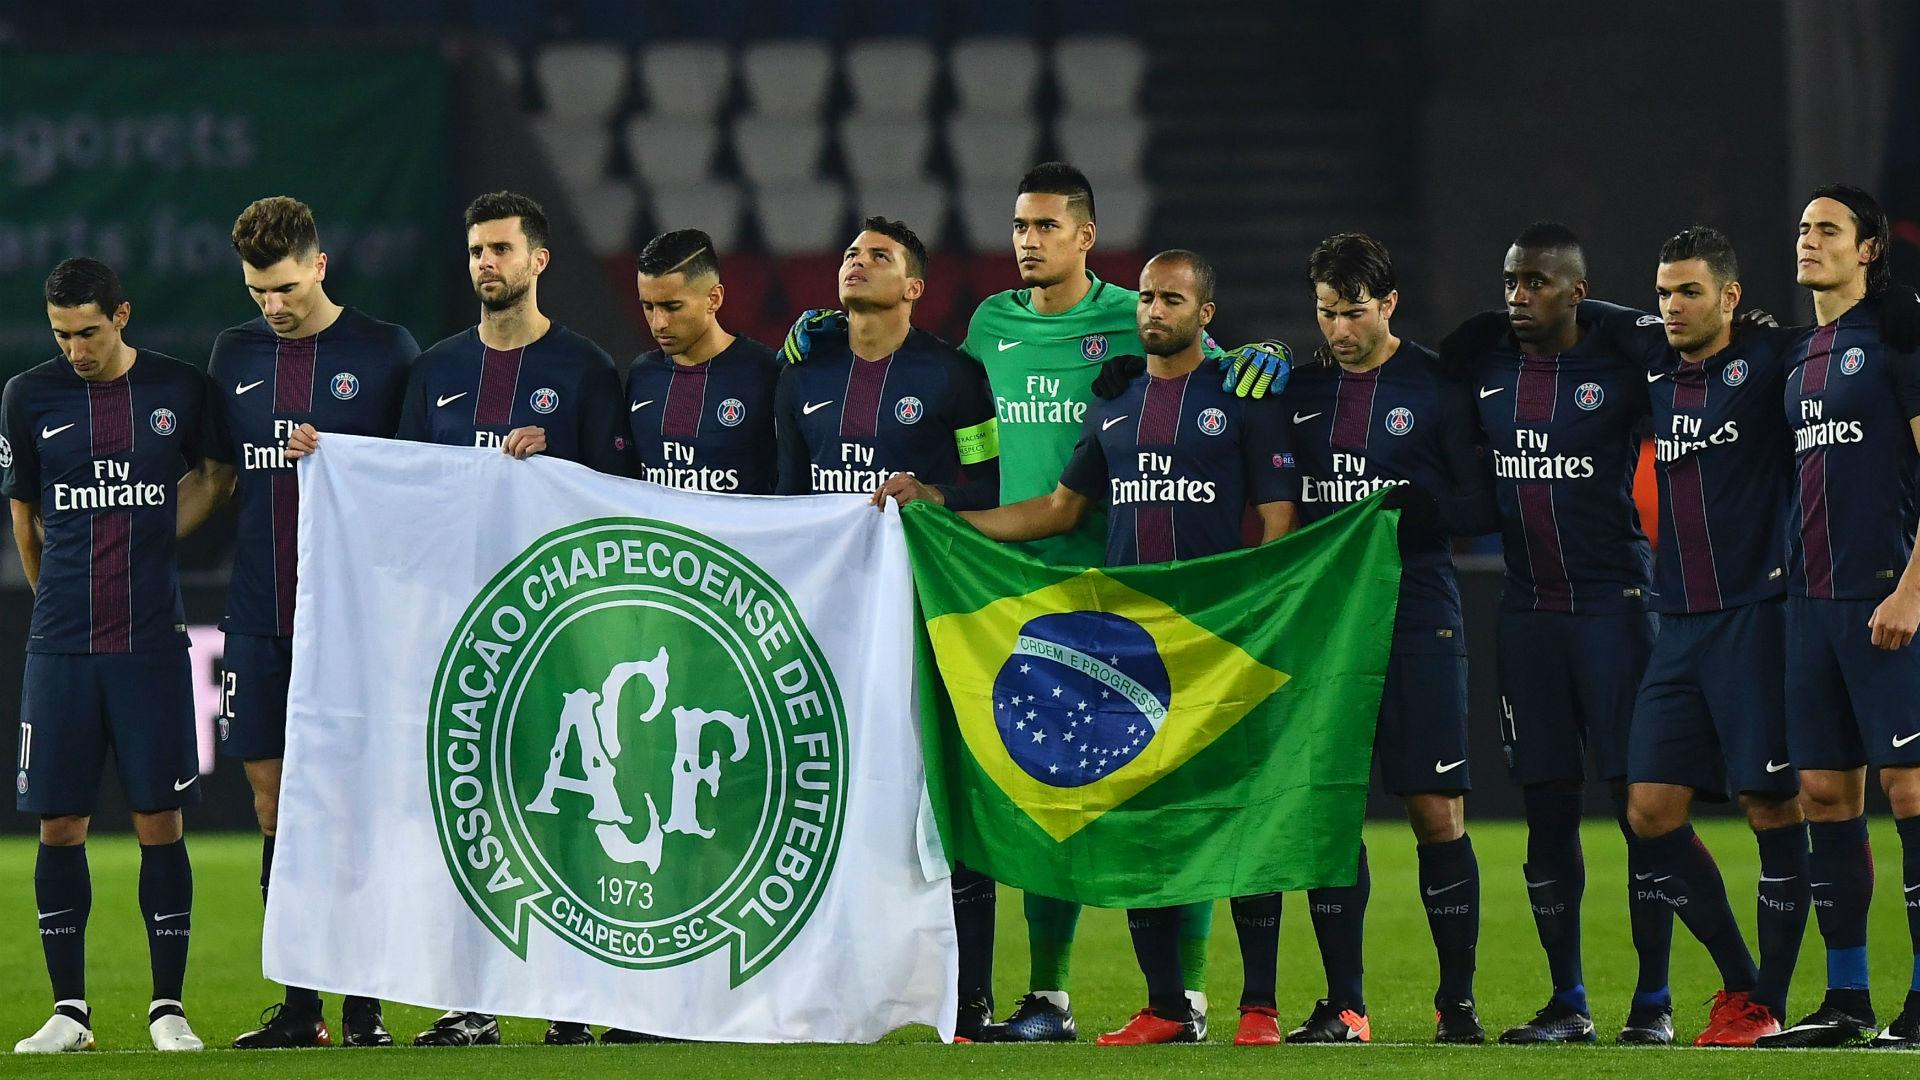 PSG Ludogorets tribute to Chapecoense Champions League 06122016